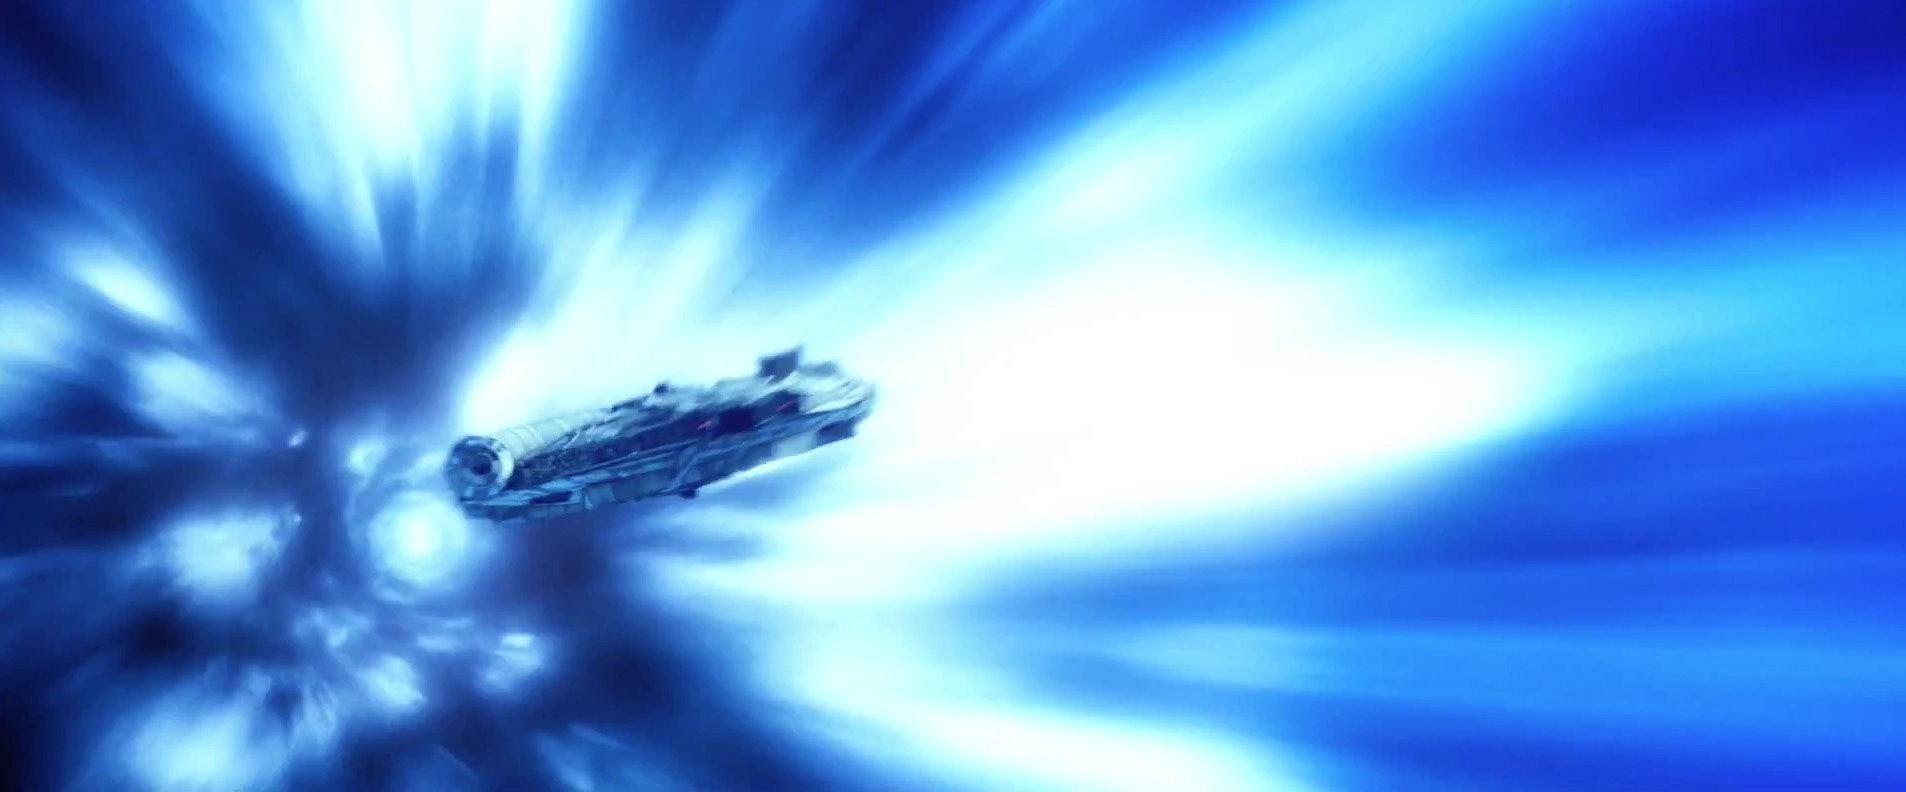 Last Jedi Version Of A Post Credits Scene Is New For Star Wars